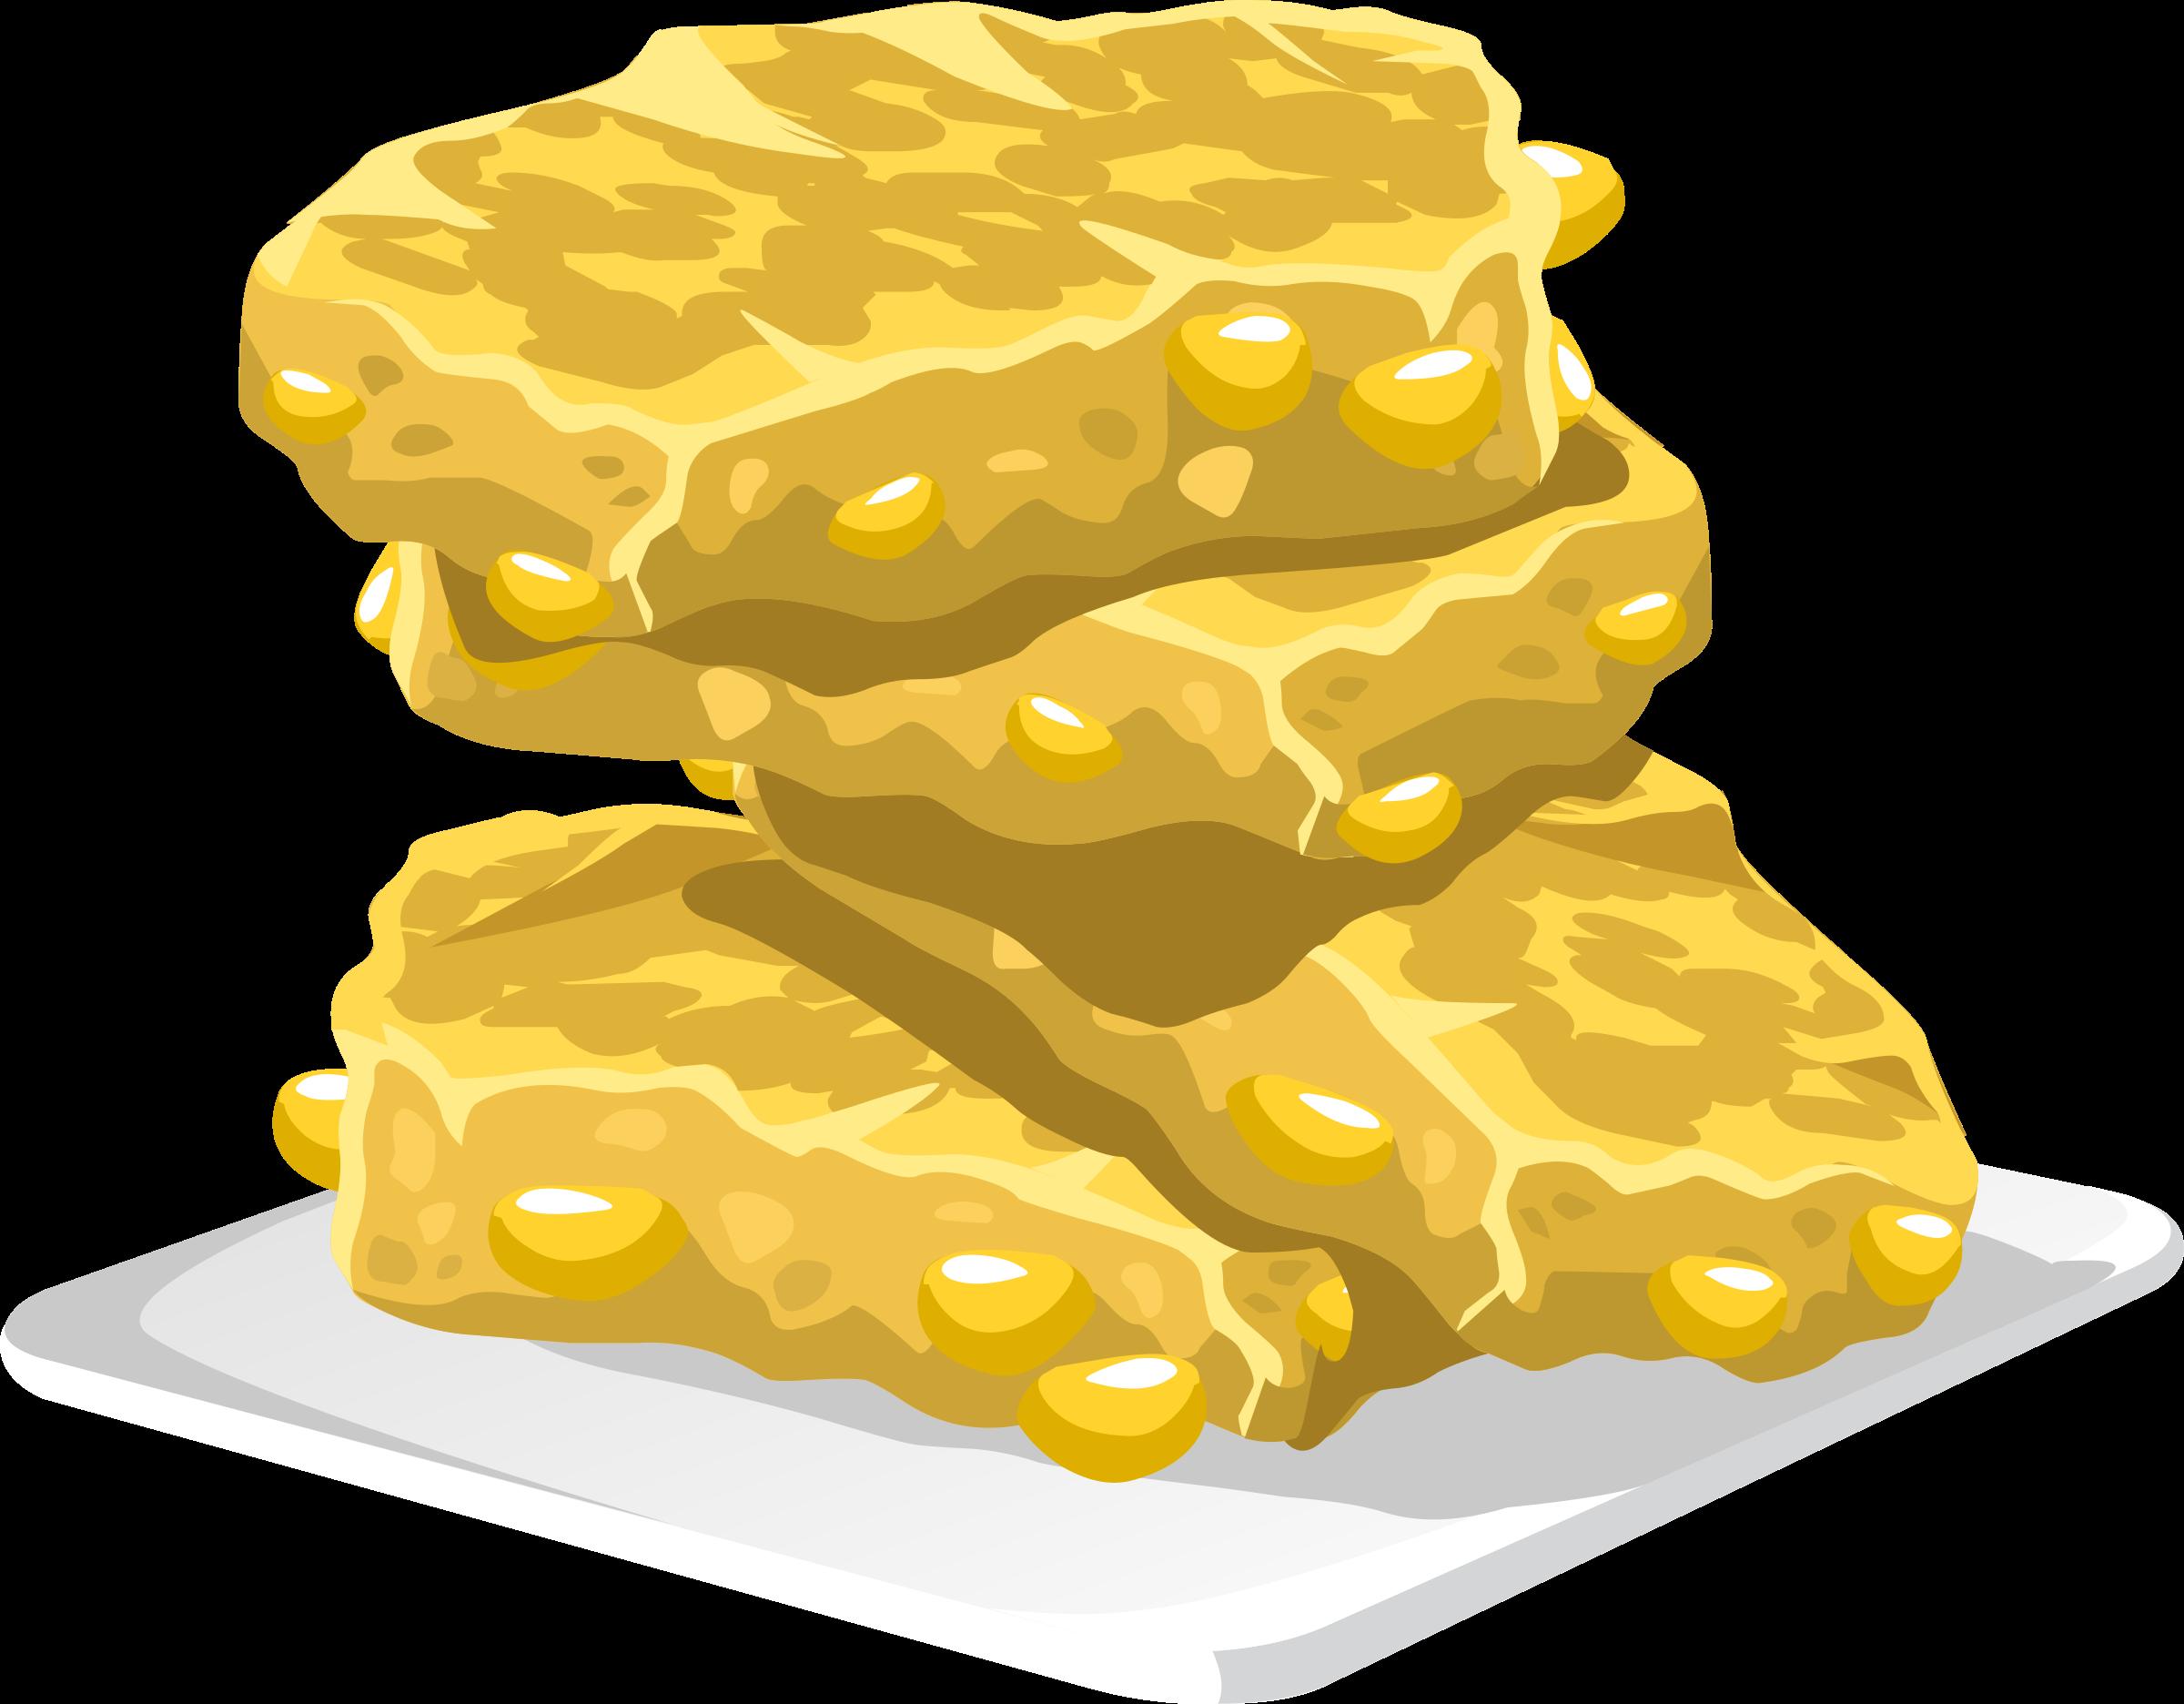 Glitch clipart sweet Clipart Food BIG IMAGE Corny